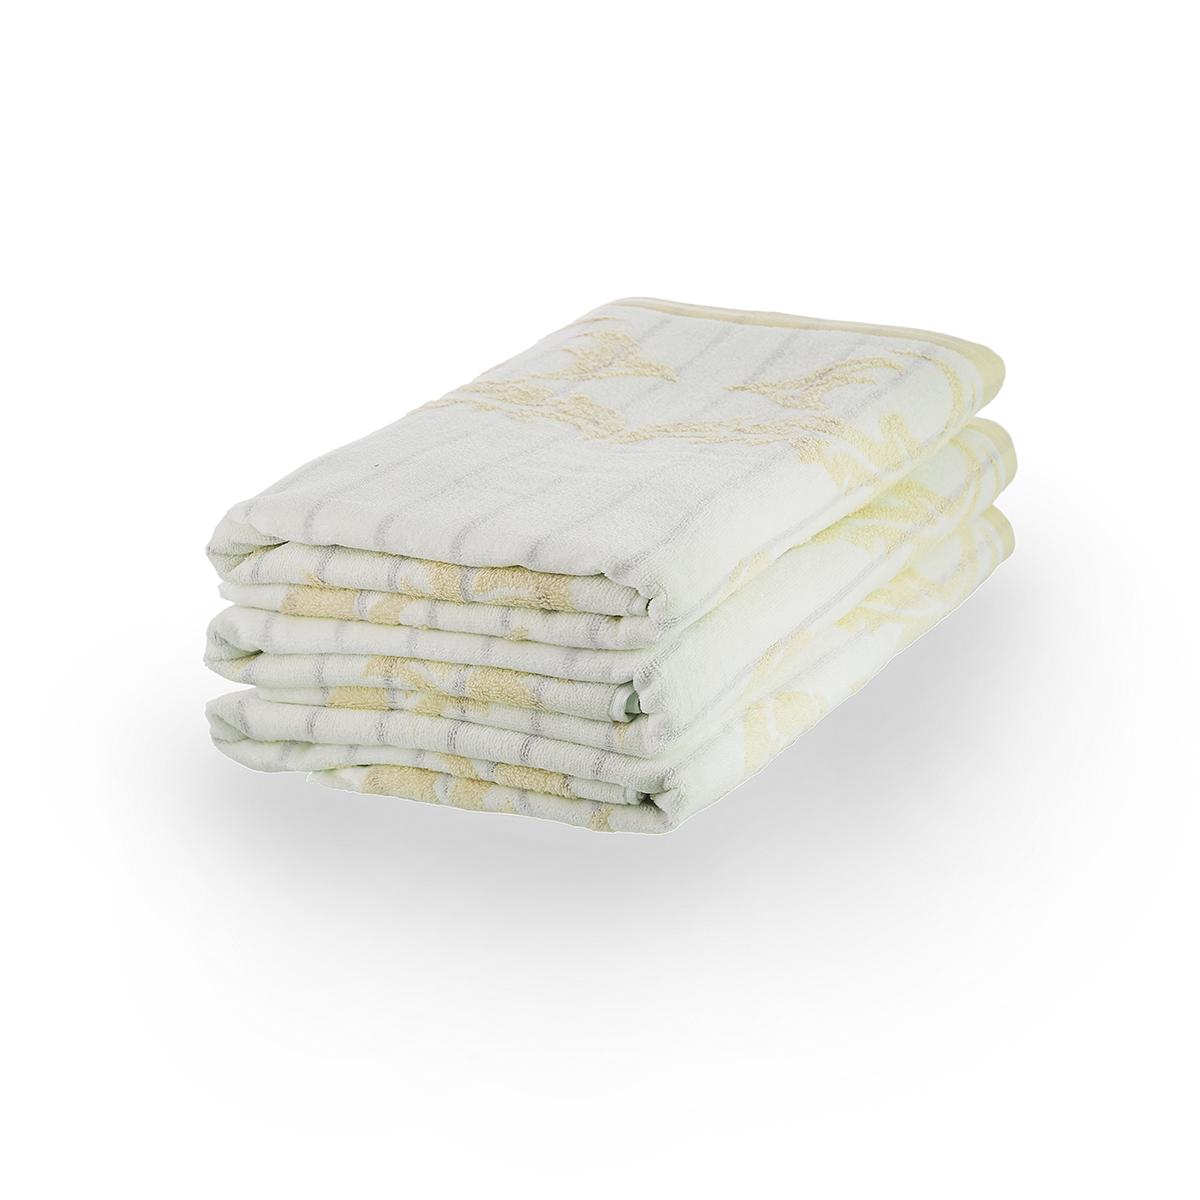 Полотенце Гламур Бежевый, размер 34х78 смМахровые полотенца<br>Плотность ткани:360 г/кв. м.<br><br>Тип: Полотенце<br>Размер: 34х78<br>Материал: Велюр